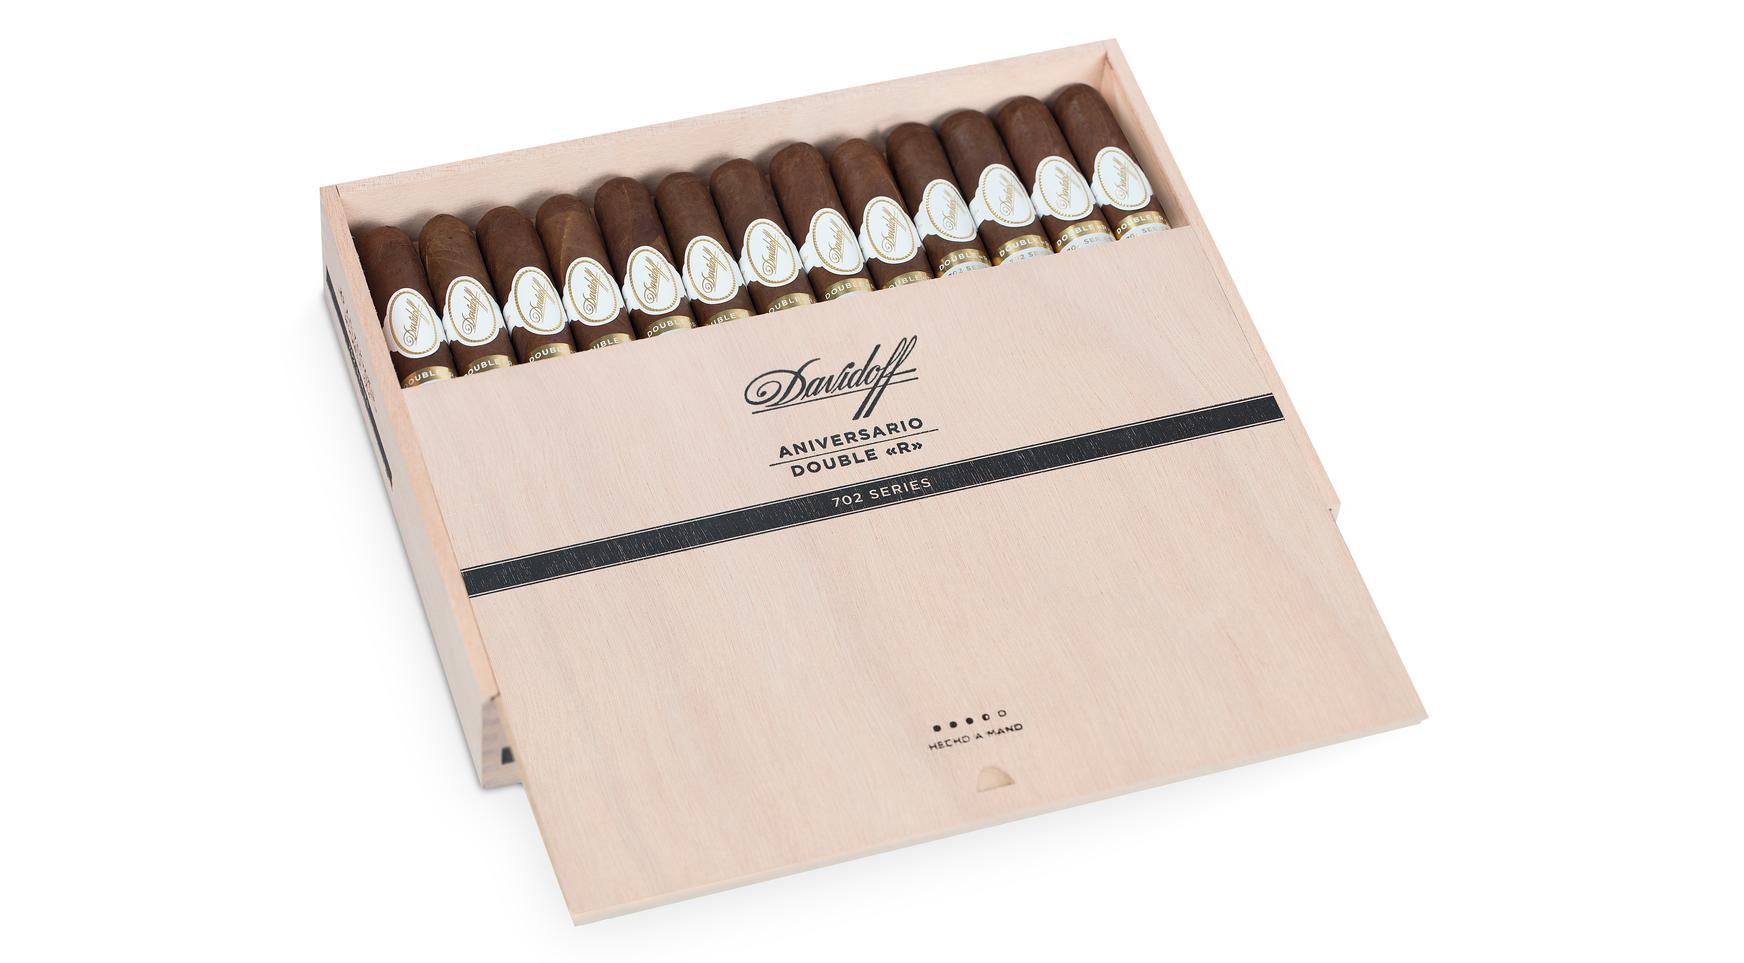 Cigar News: Davidoff 702 Series Adds New Twist to Old Favorites